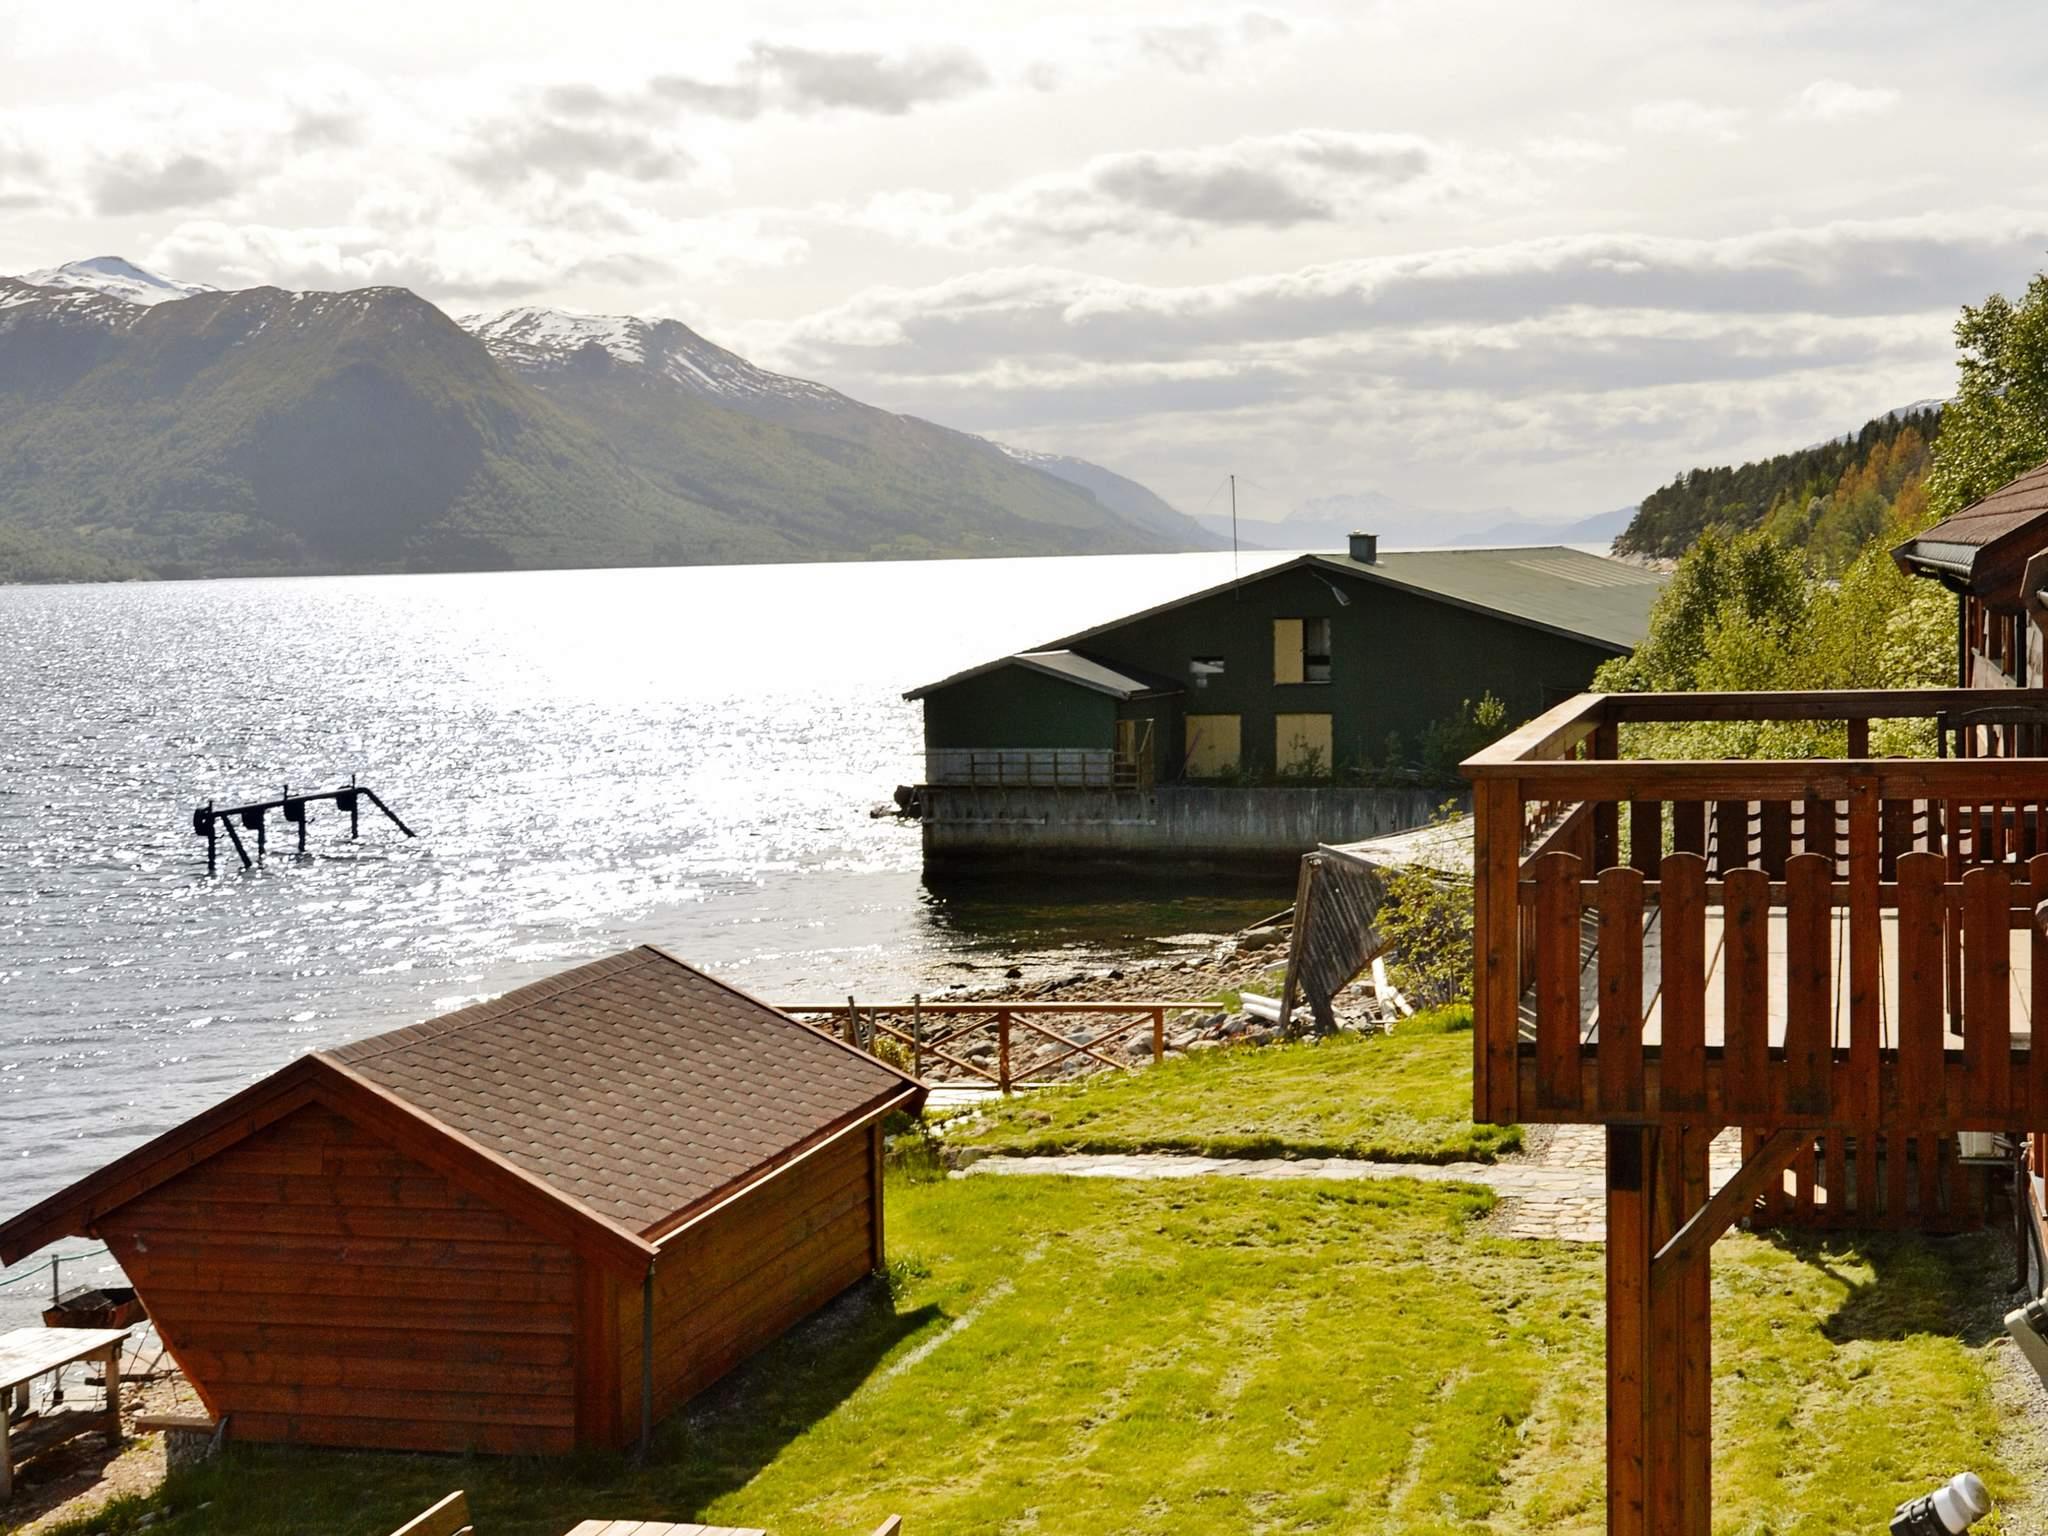 Ferienhaus Eidsvåg (135541), Eidsvåg, More - Romsdal, Westnorwegen, Norwegen, Bild 3